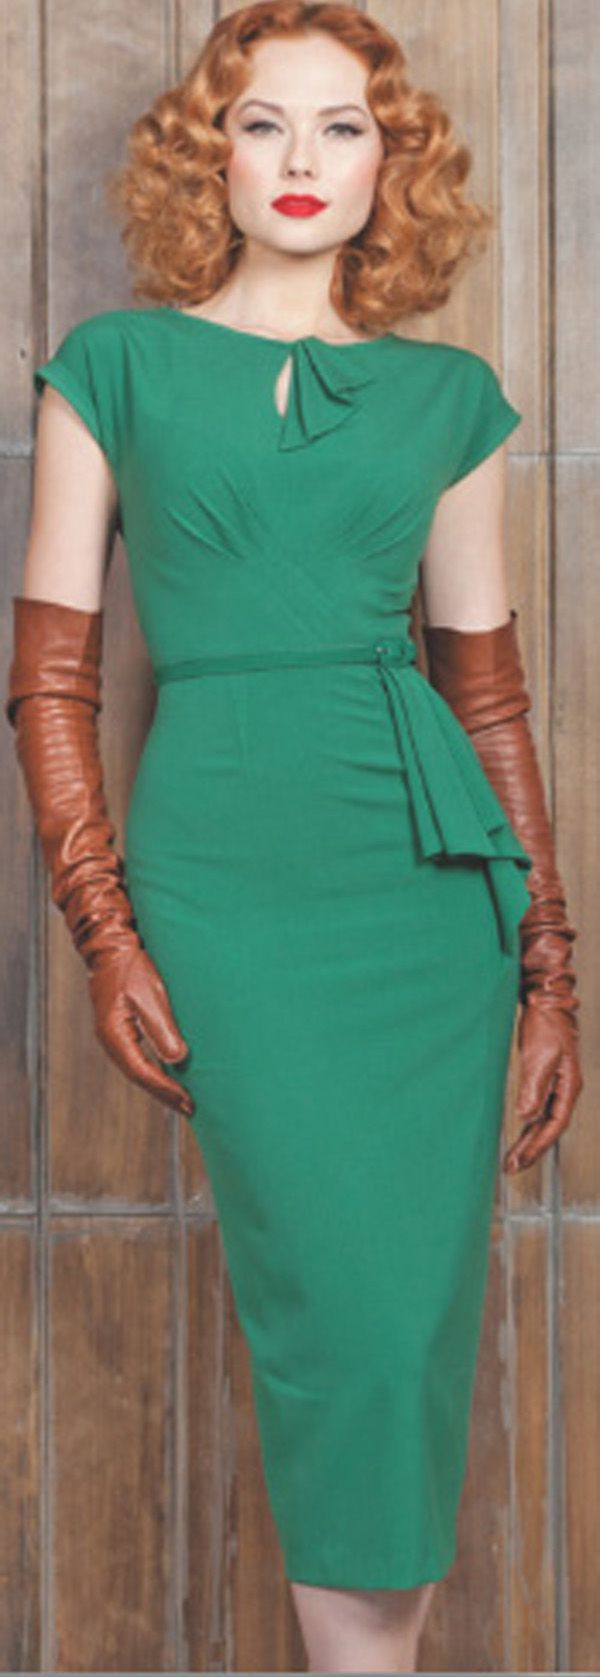 50's style dresses plus & regular stop staring! vintage dresses